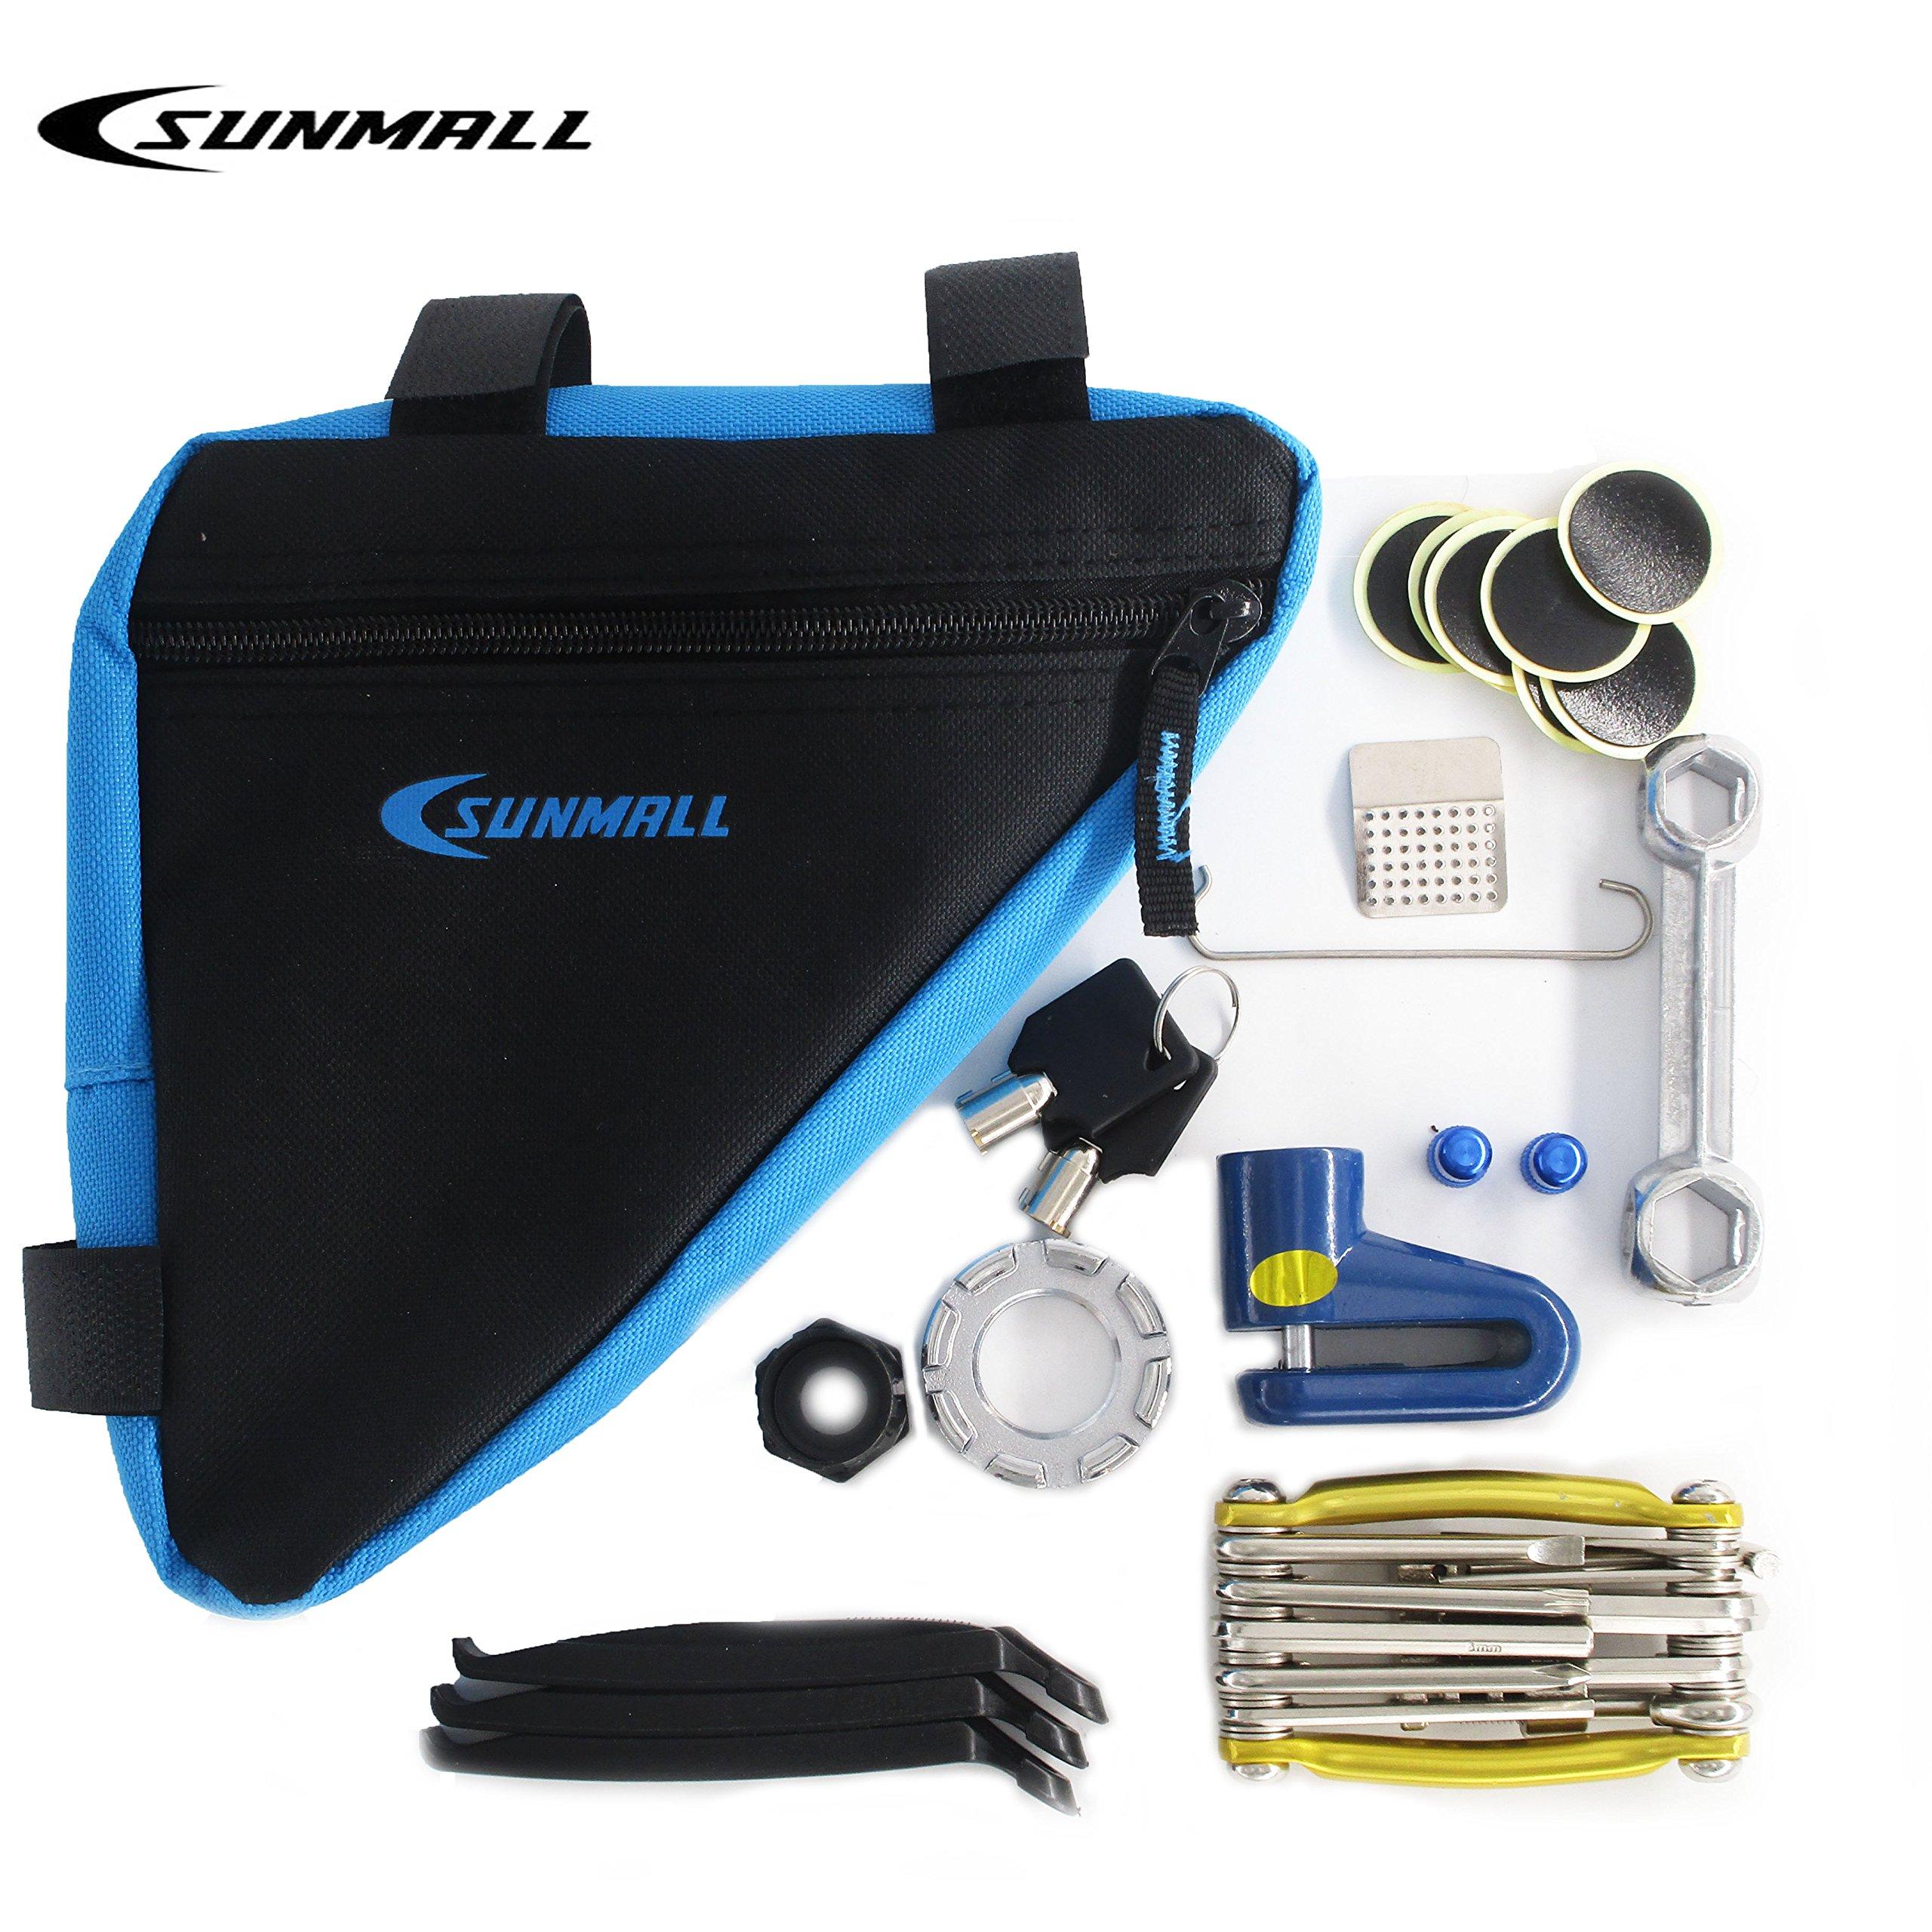 SUNMALL Upgrade Bicycle Maintenance Kit with waterproof bike bag,Bicycle Puncture Repair Kit,chain link repair kit